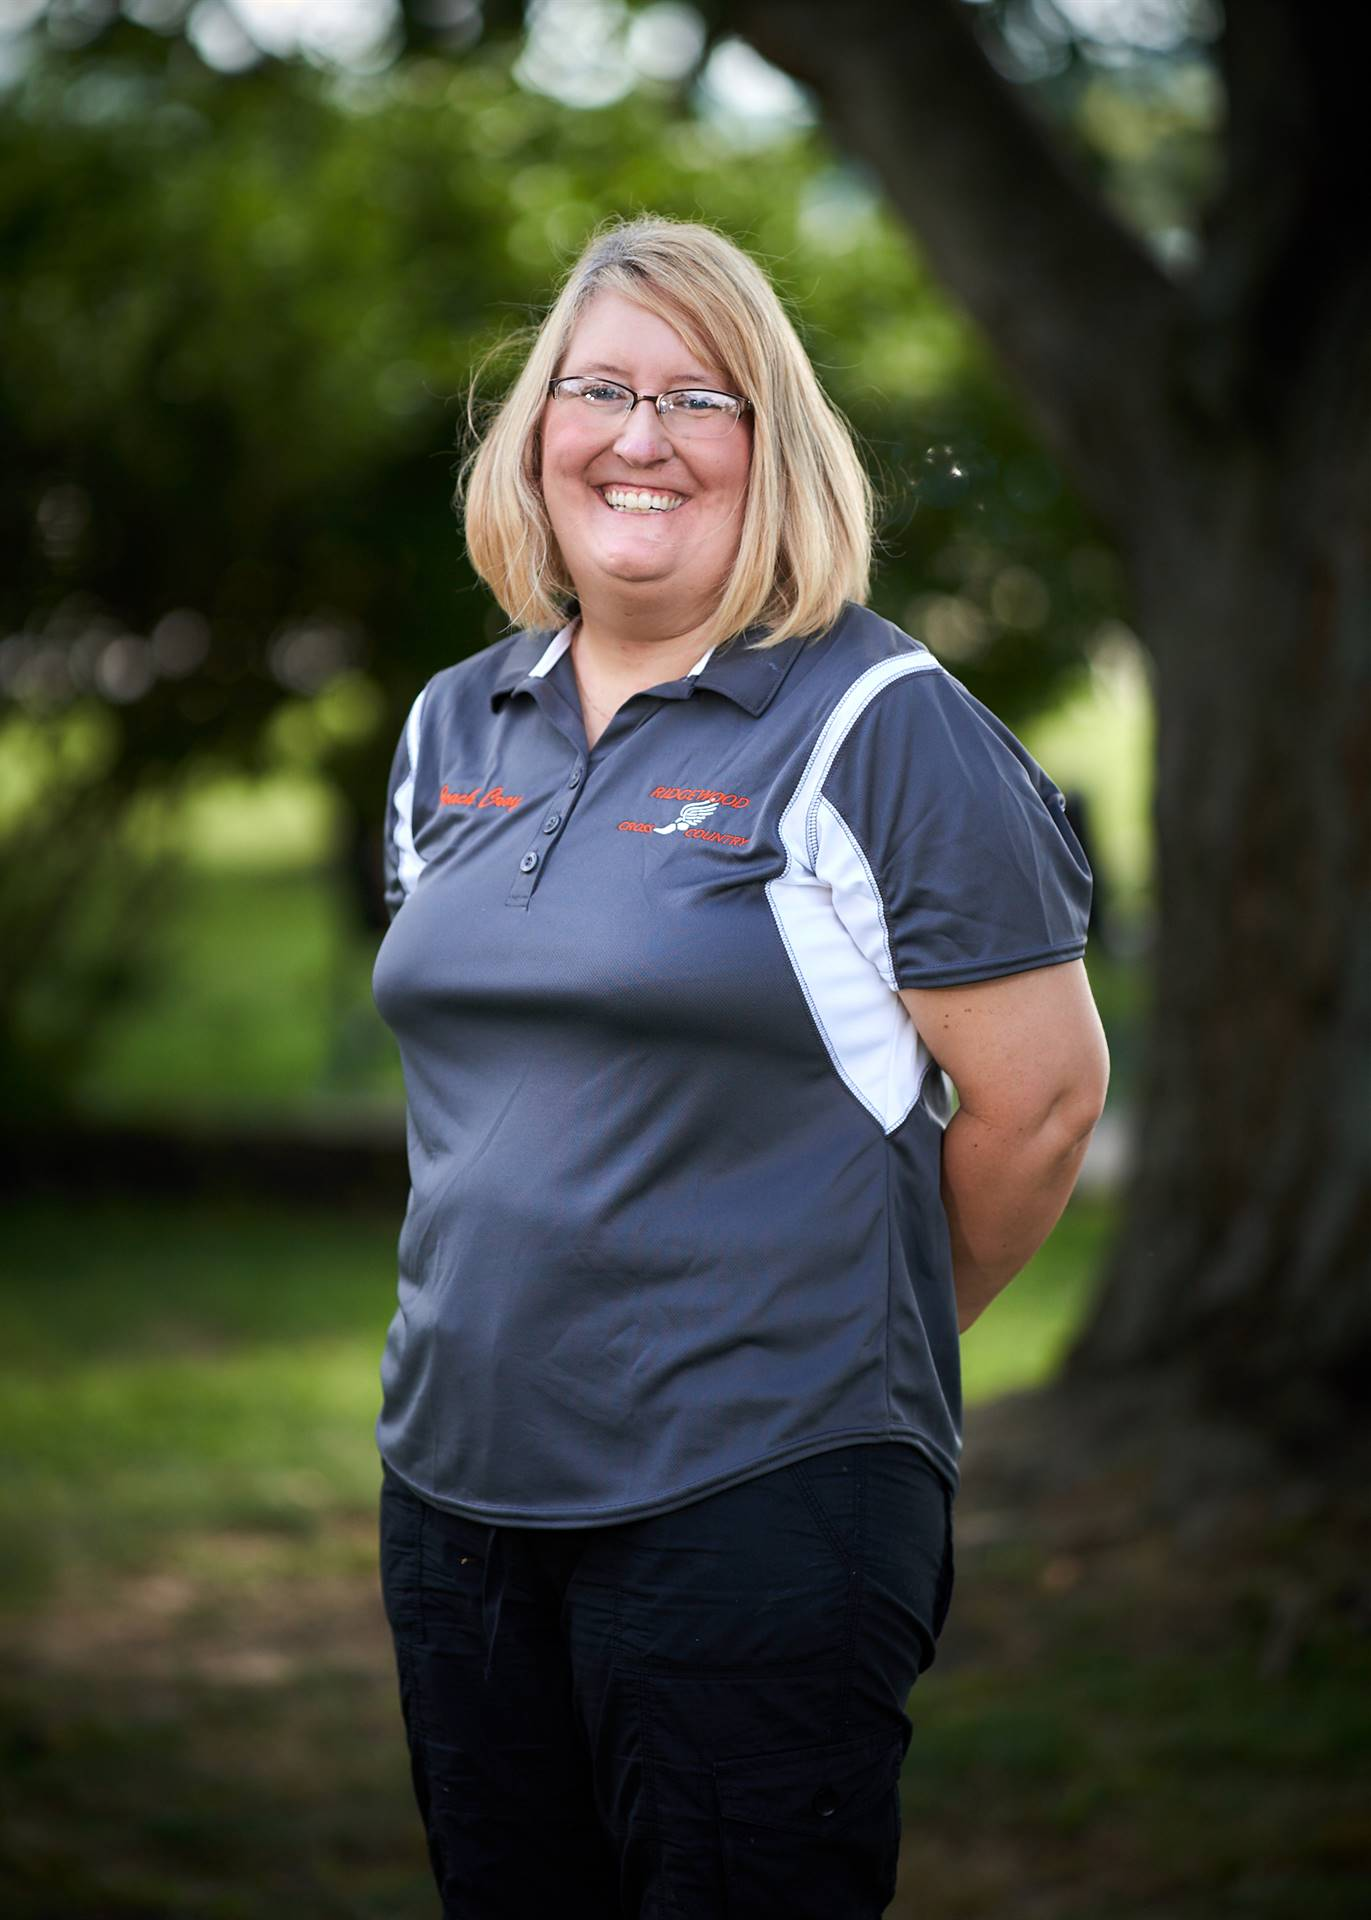 HS CC - Head Coach Wendy Croy